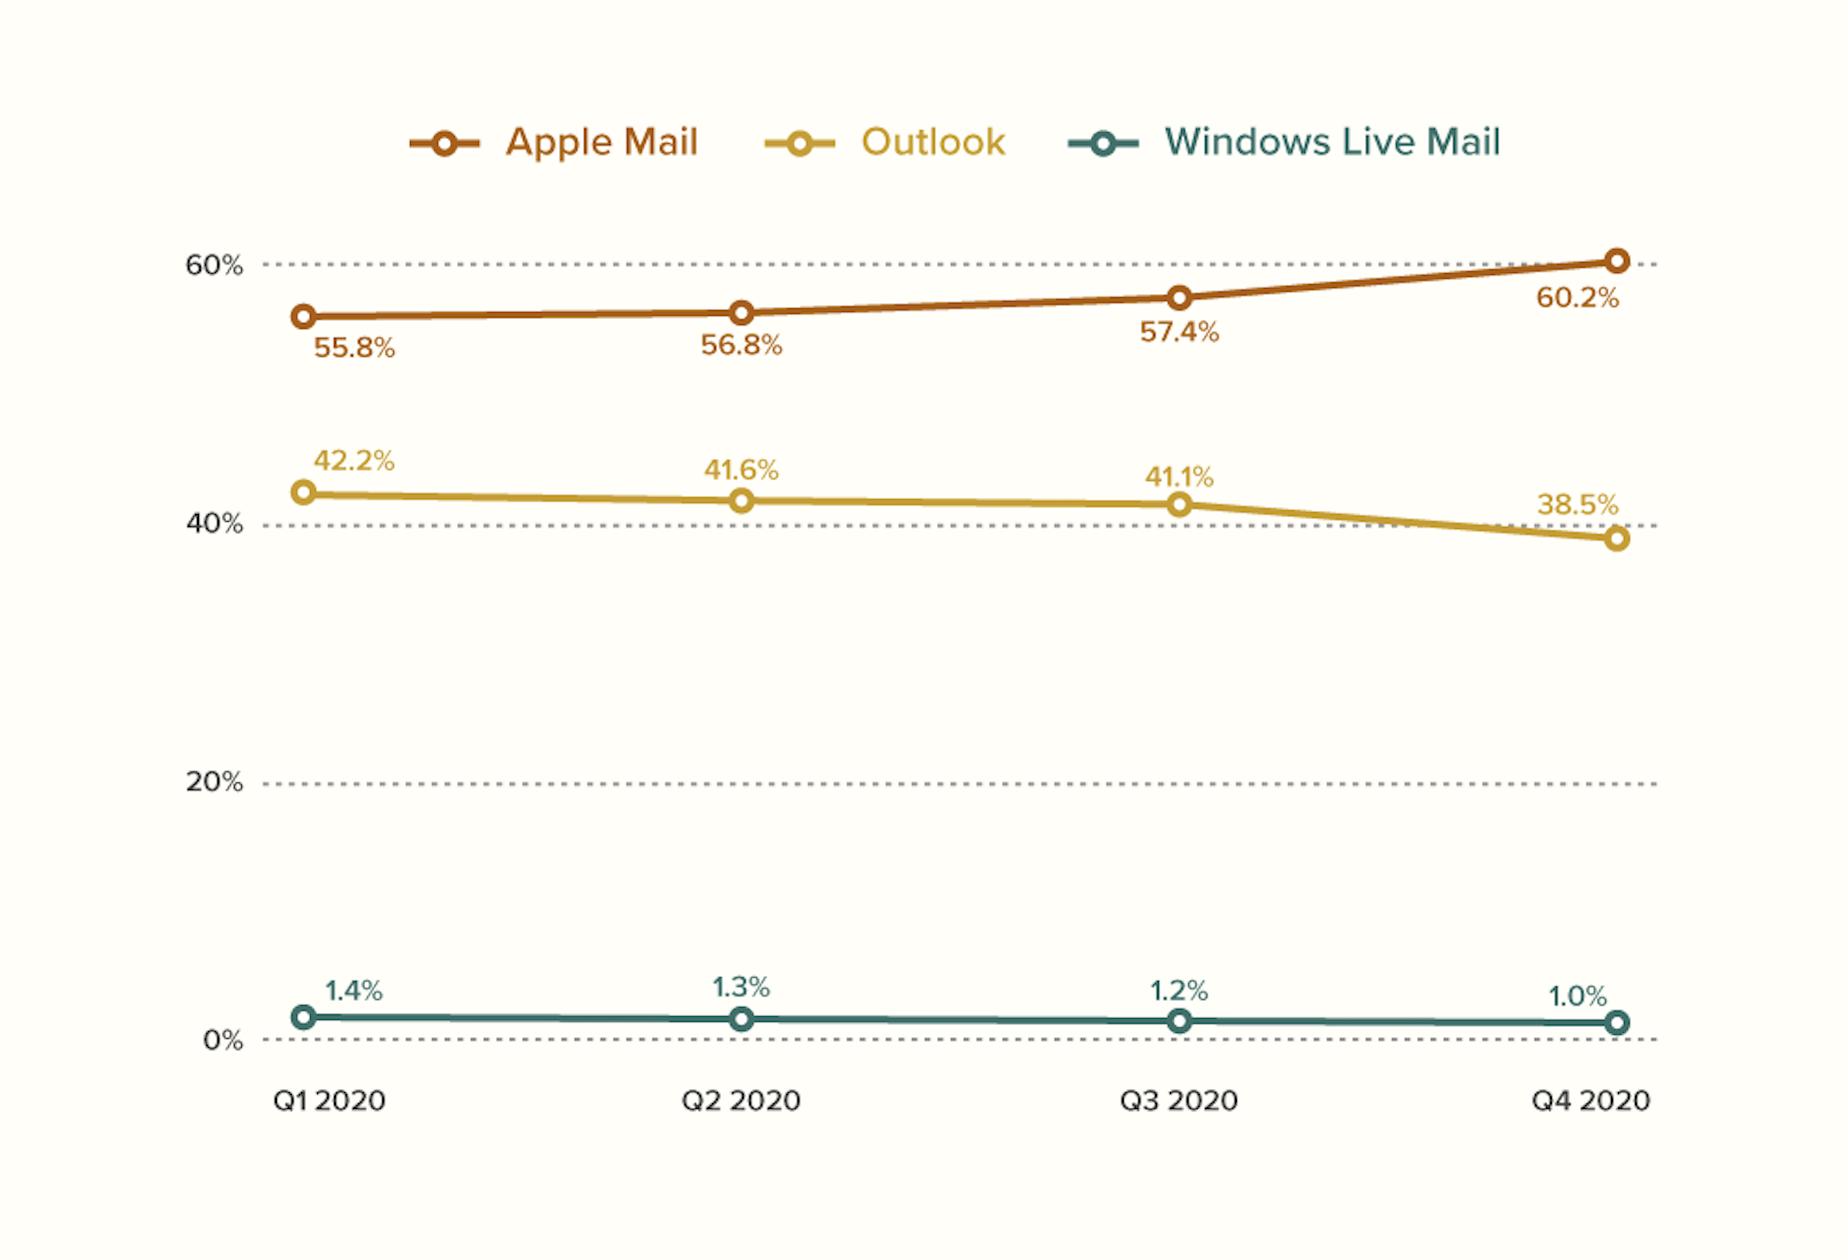 2020 top desktop email client market share via Litmus Email Analytics